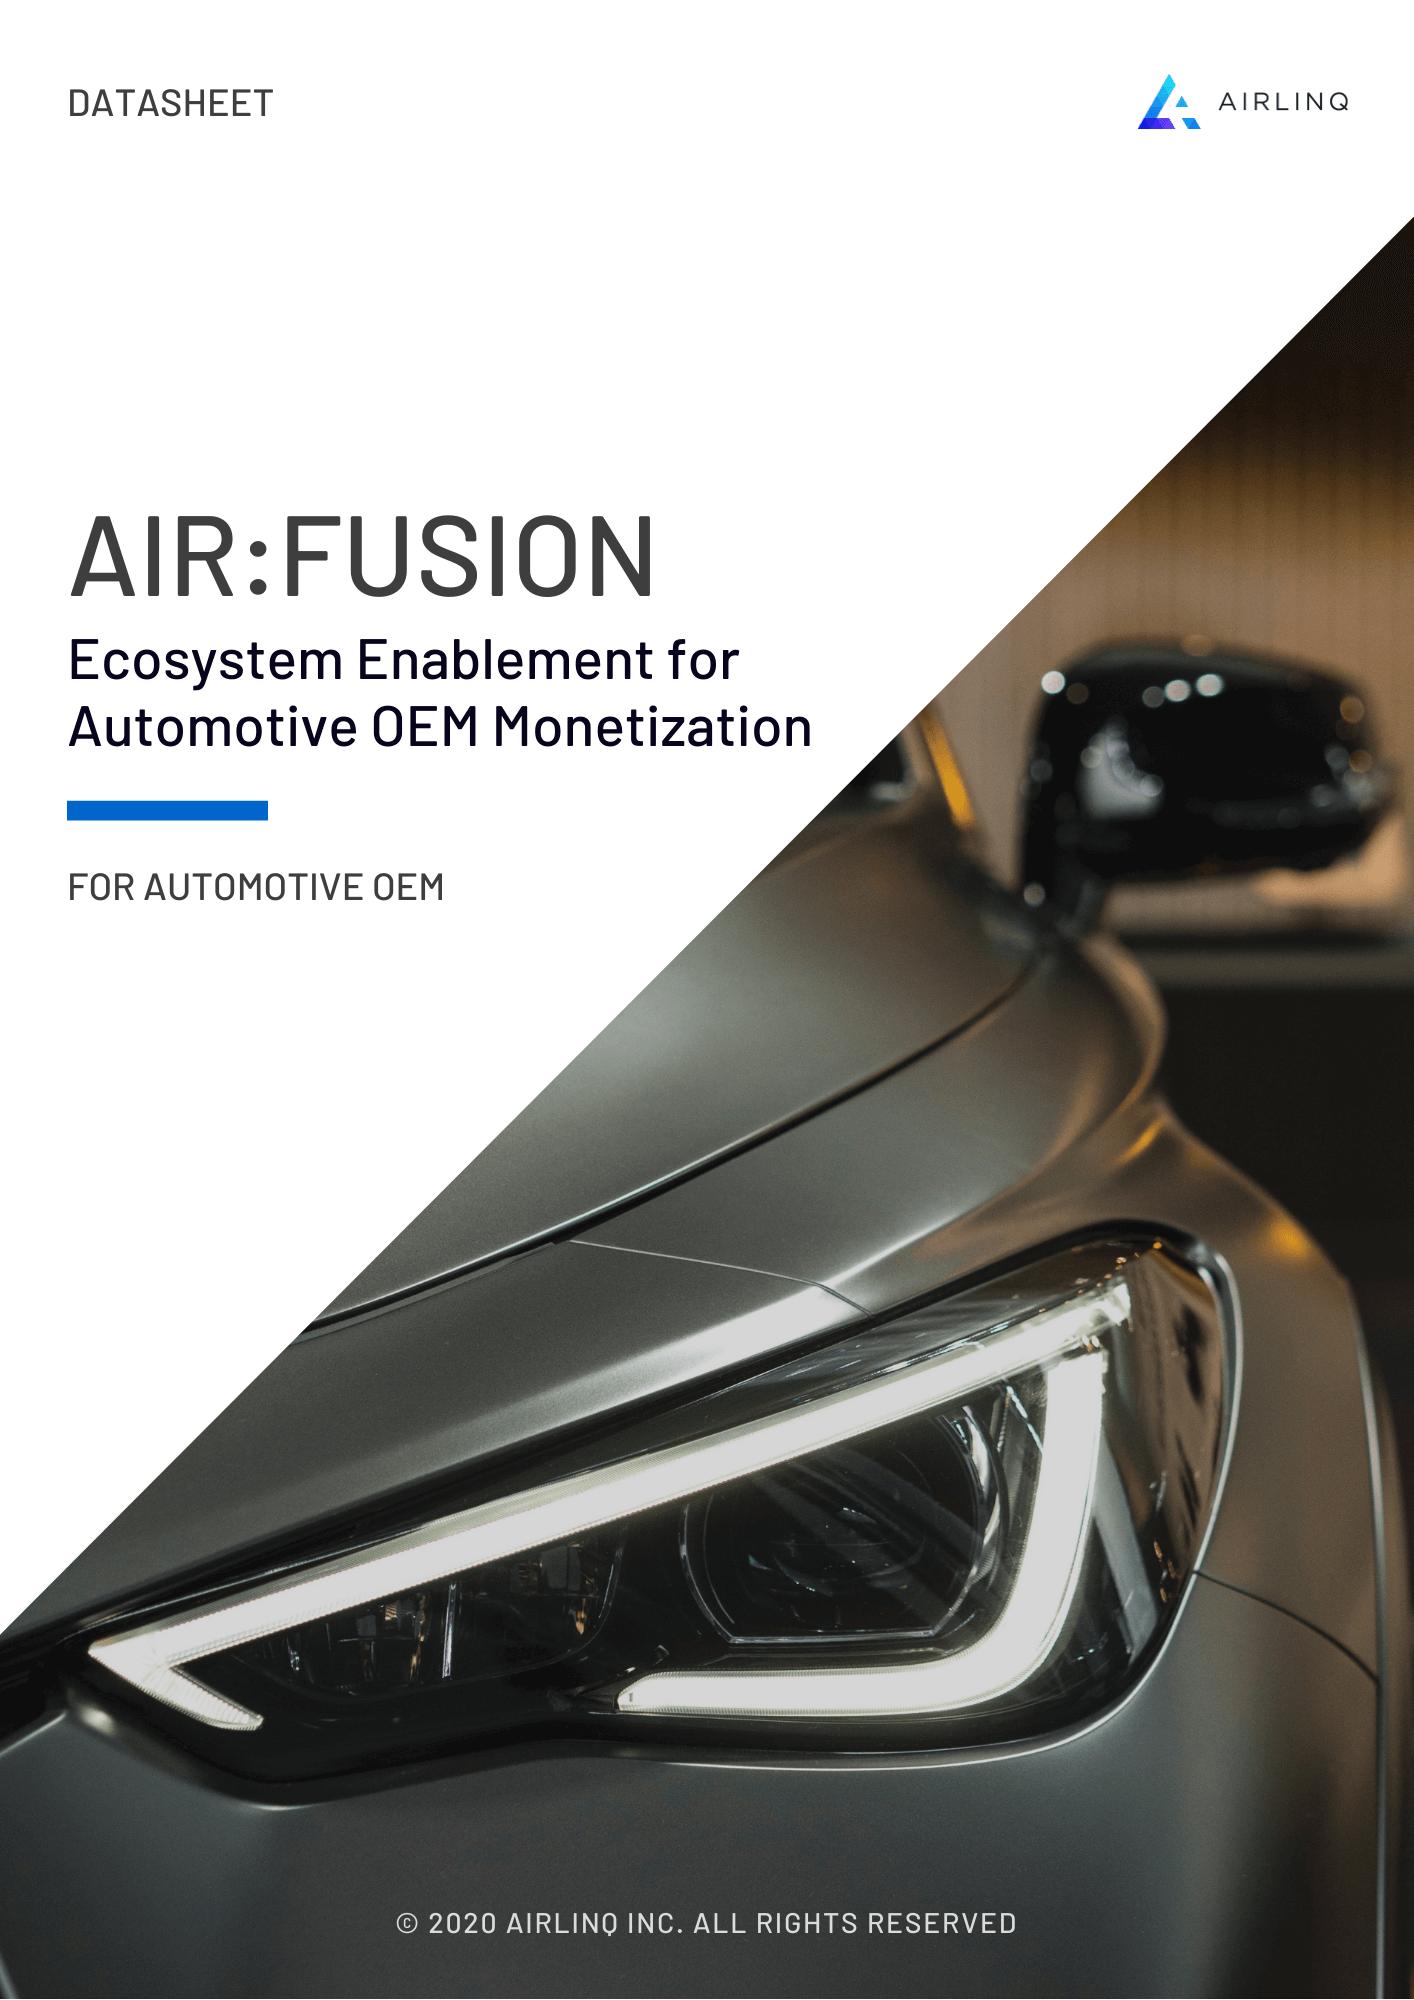 AIR:FUSION – Ecosystem Enablement for Automotive OEM Monetization